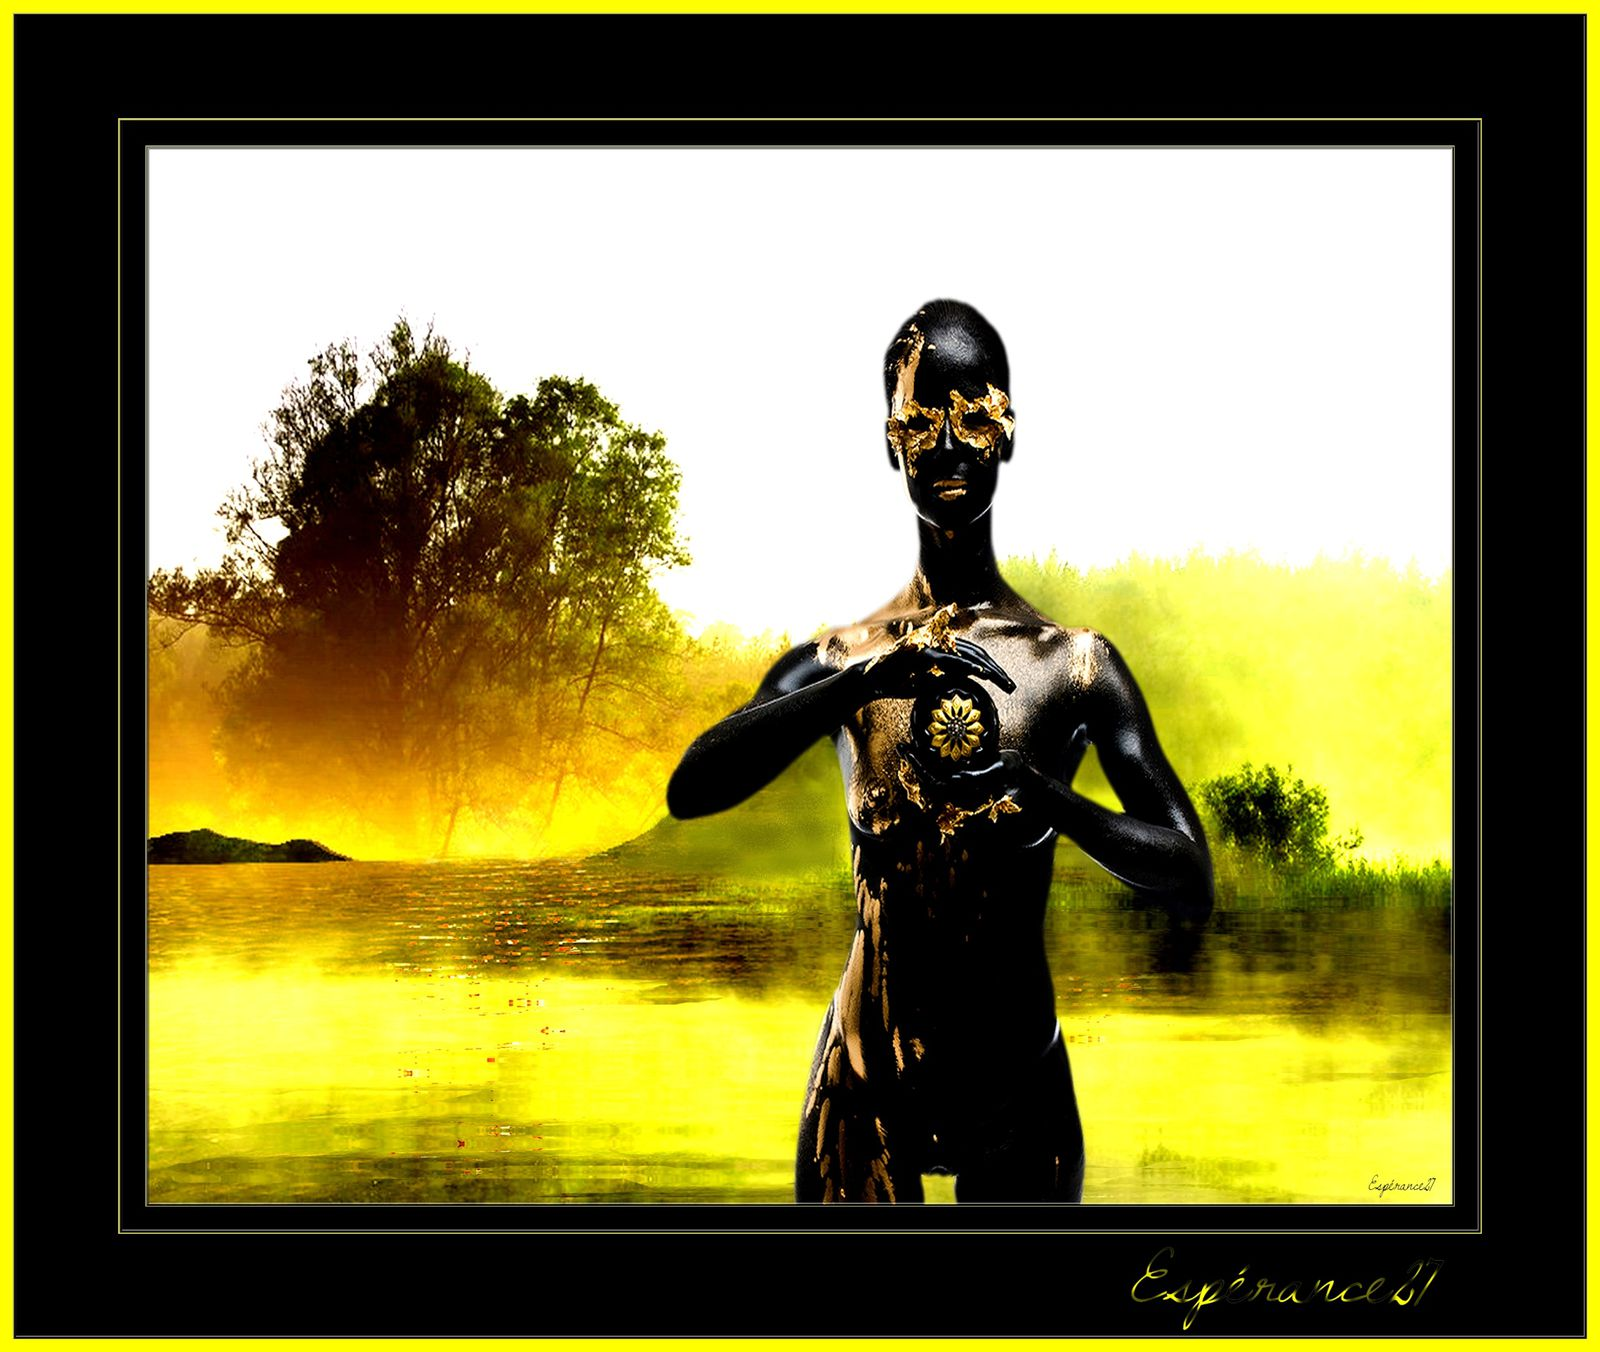 http://idata.over-blog.com/3/91/86/55/TENDRESSE/COULEUR-AFRICAINE/AMOUR/STYLE-PEINTURE-VIRTUELLE/style-peinture-virtuelle/1696.jpg